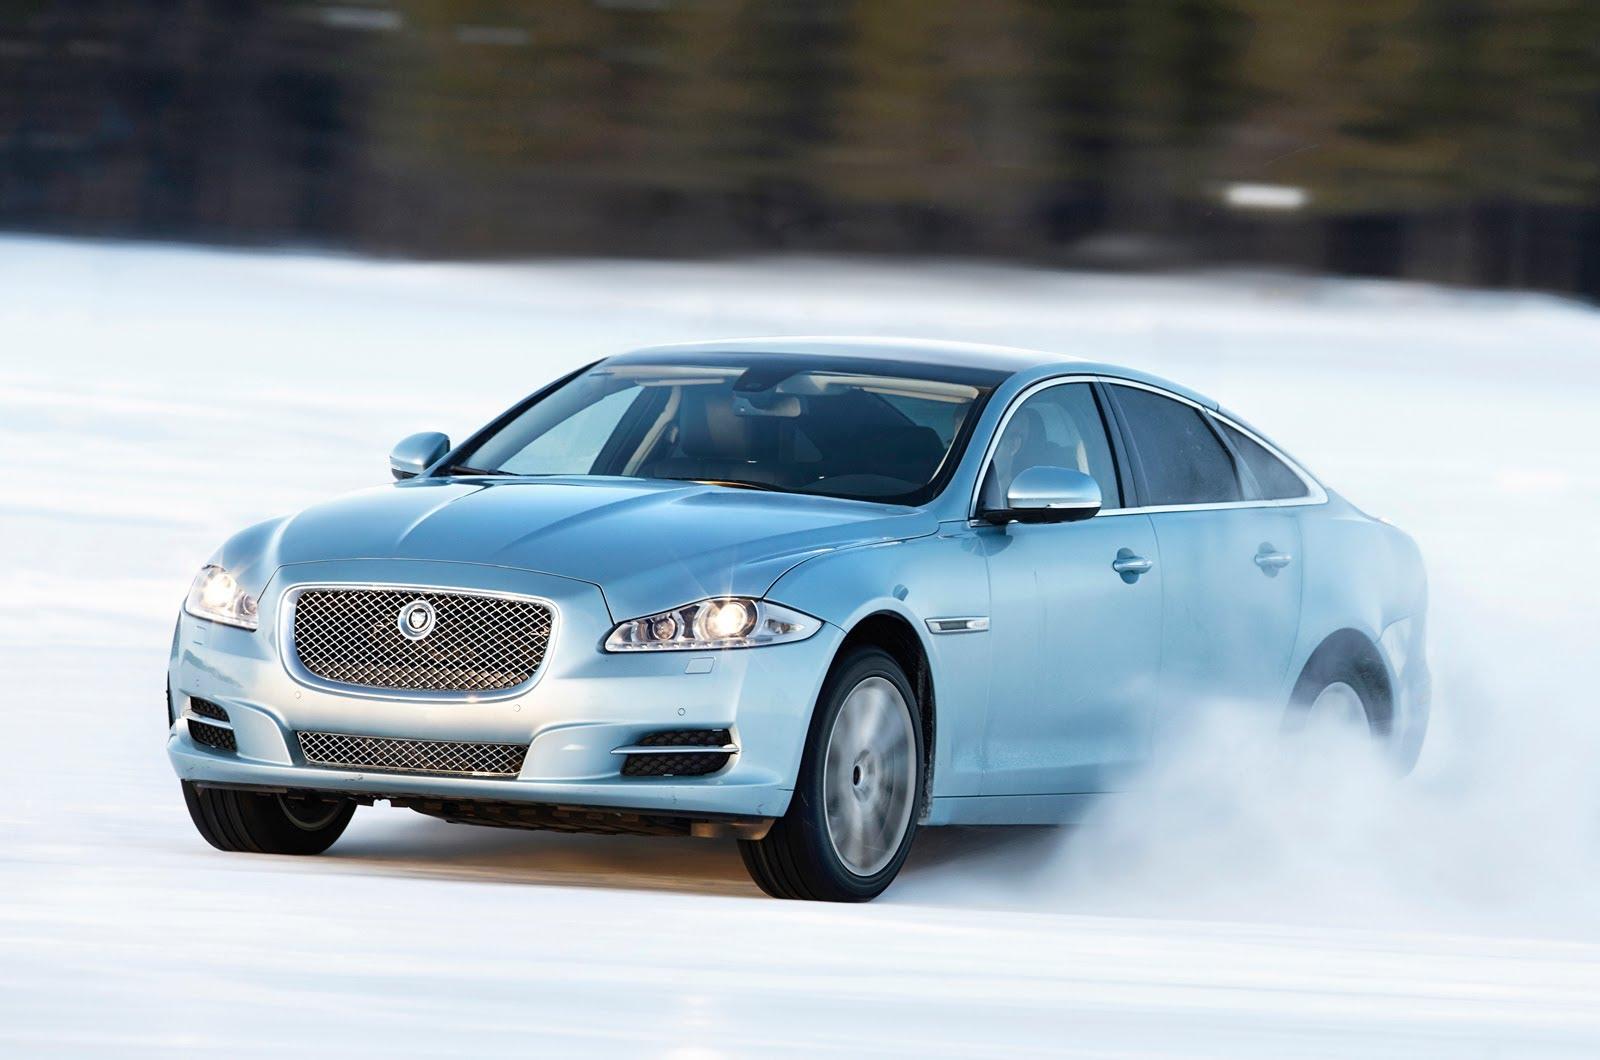 2013 Jaguar XJ AWD Ice Drivingnbsp